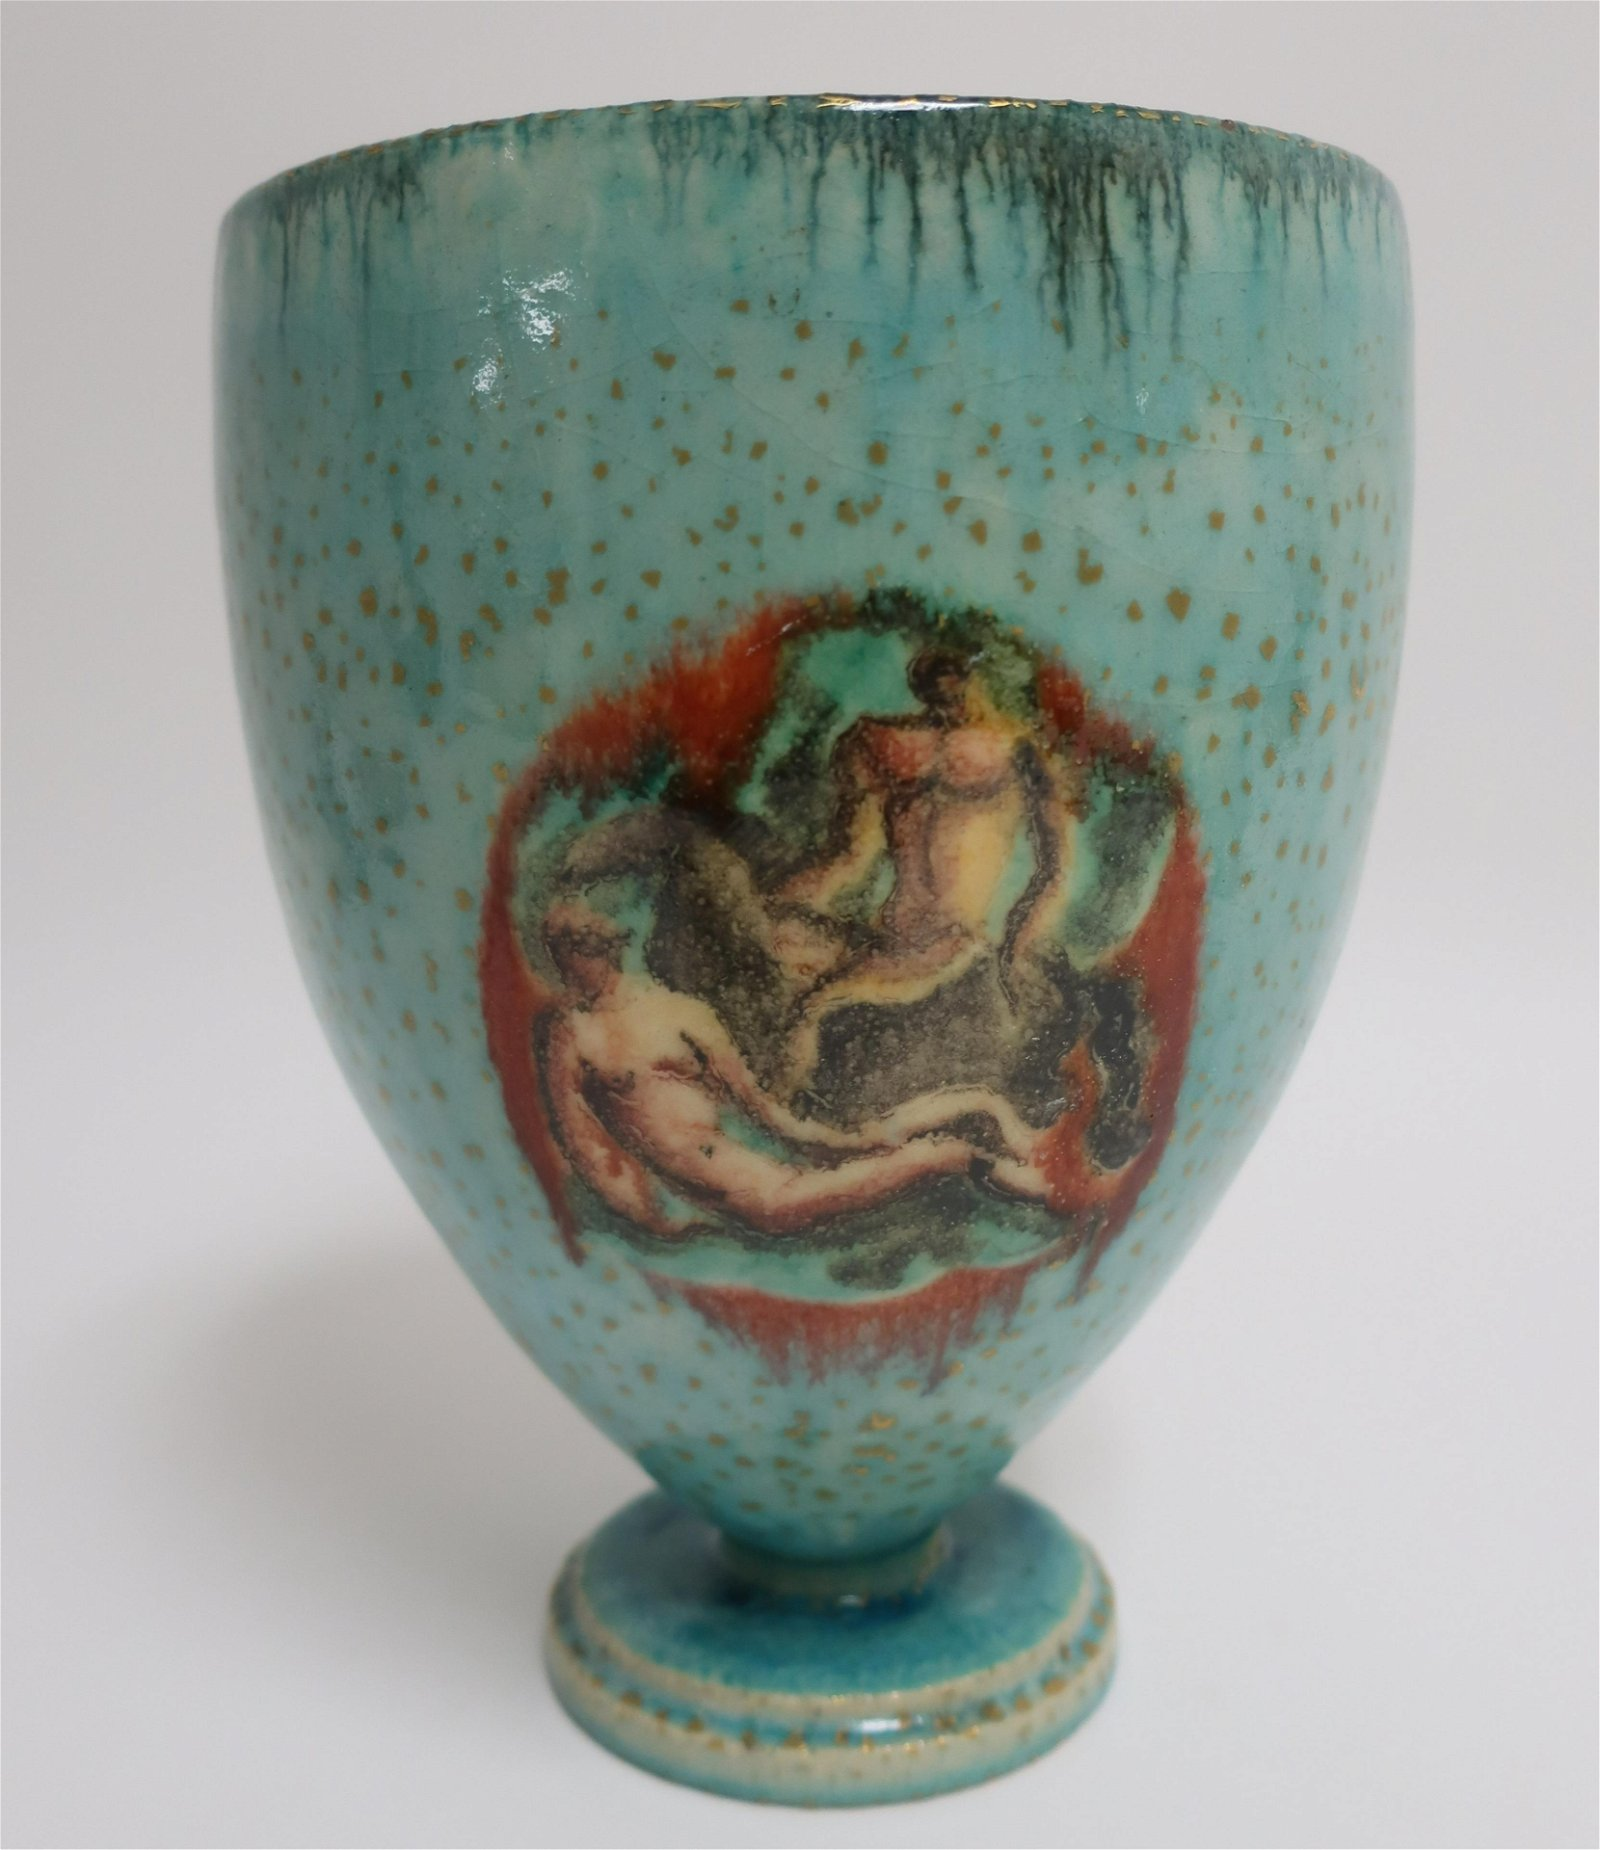 Art Deco Gilt Speckled Ground Ceramic Vase